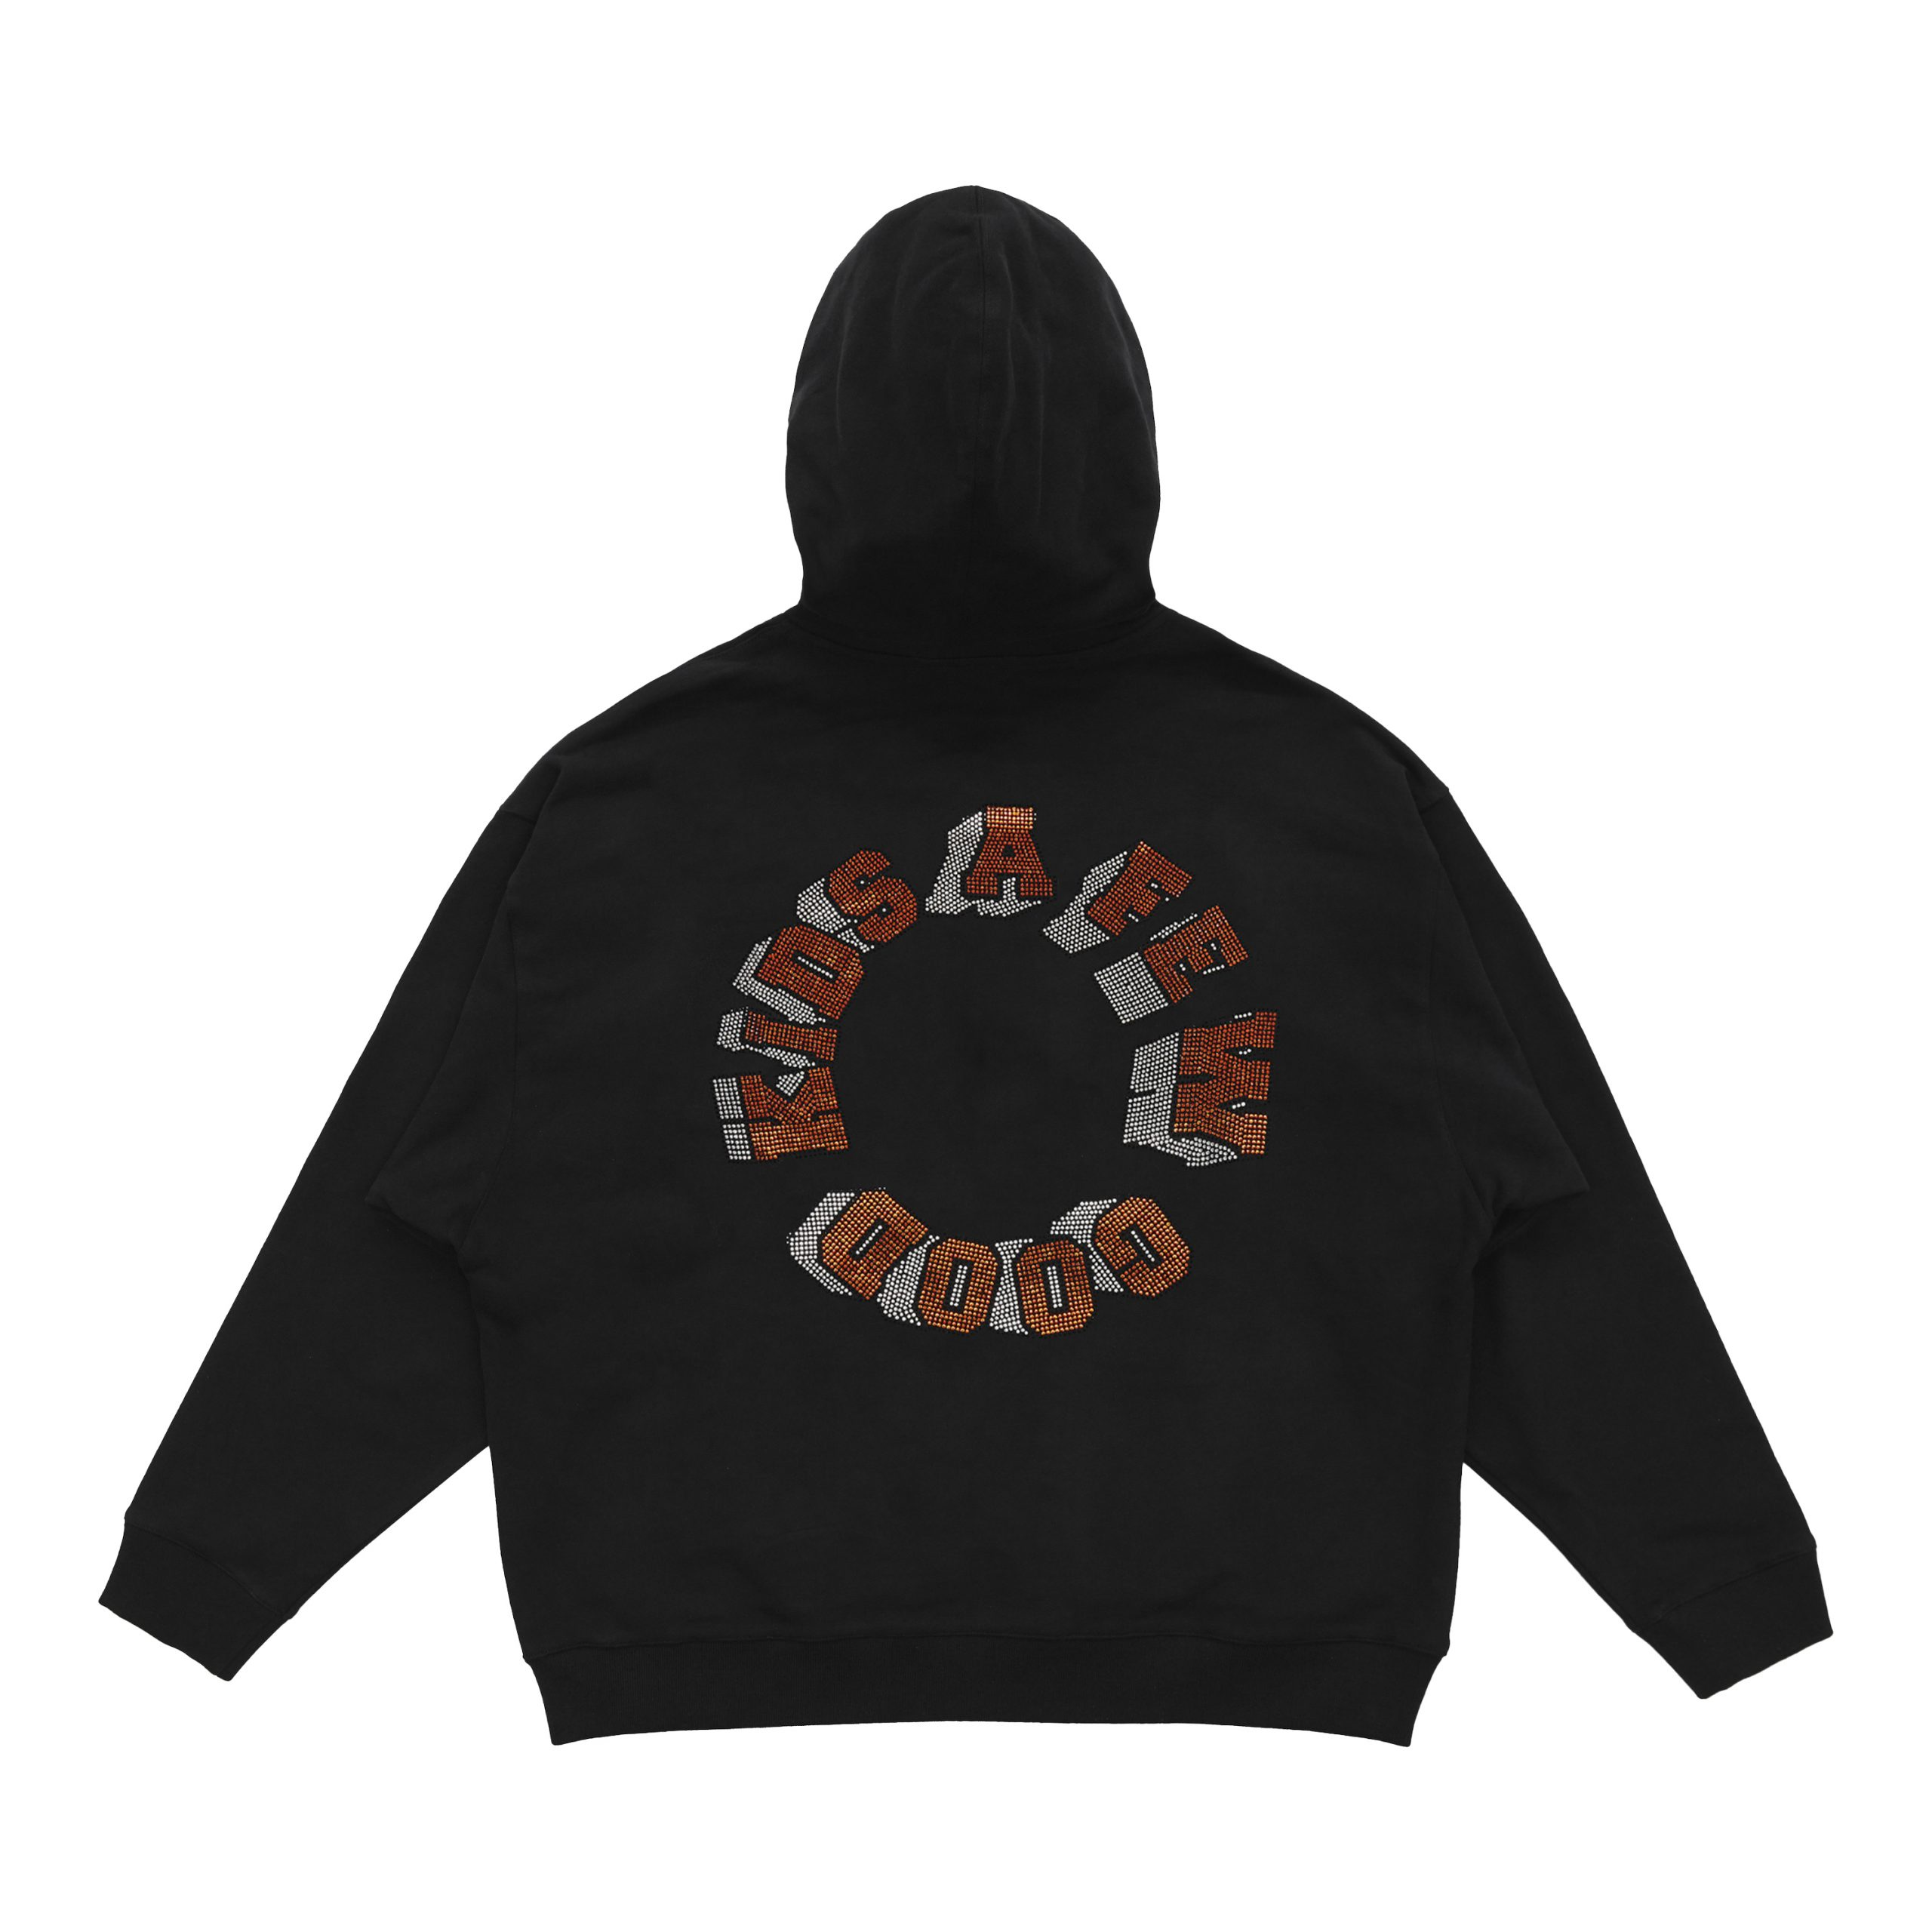 A Few Good Kids Black 3D Logo Graphic Hoodie - Streetwear - Hip Hop - Rap